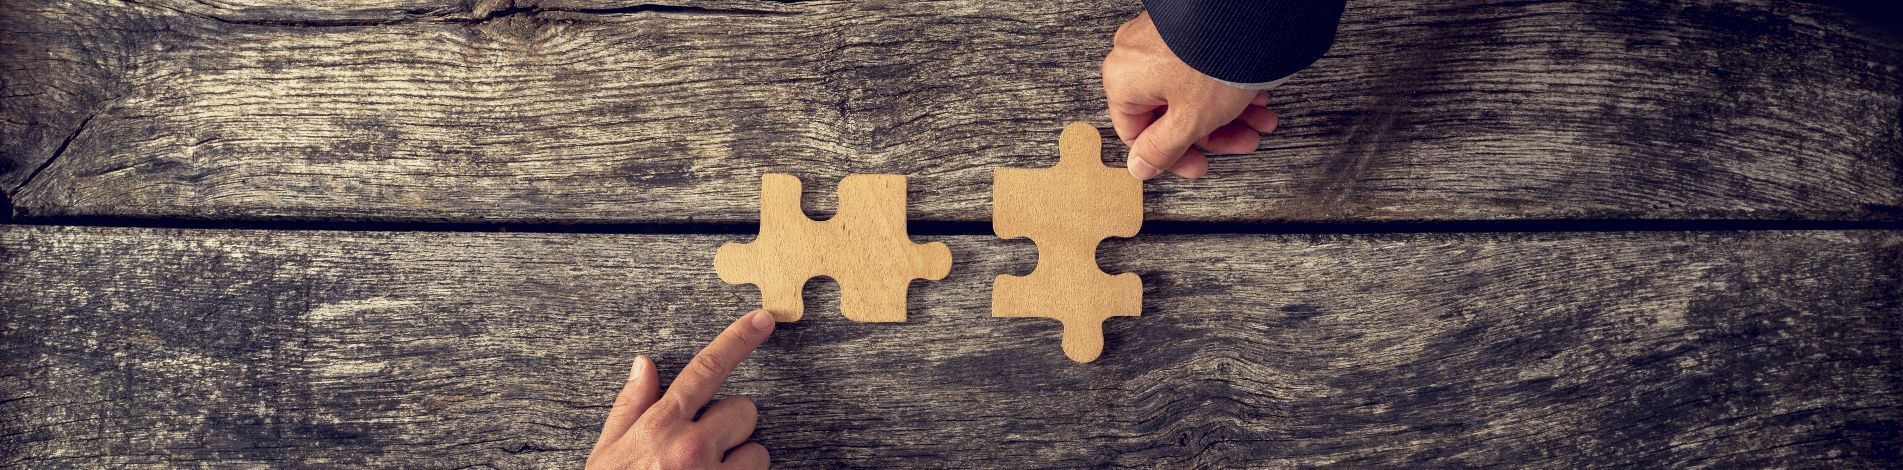 finance partner concept